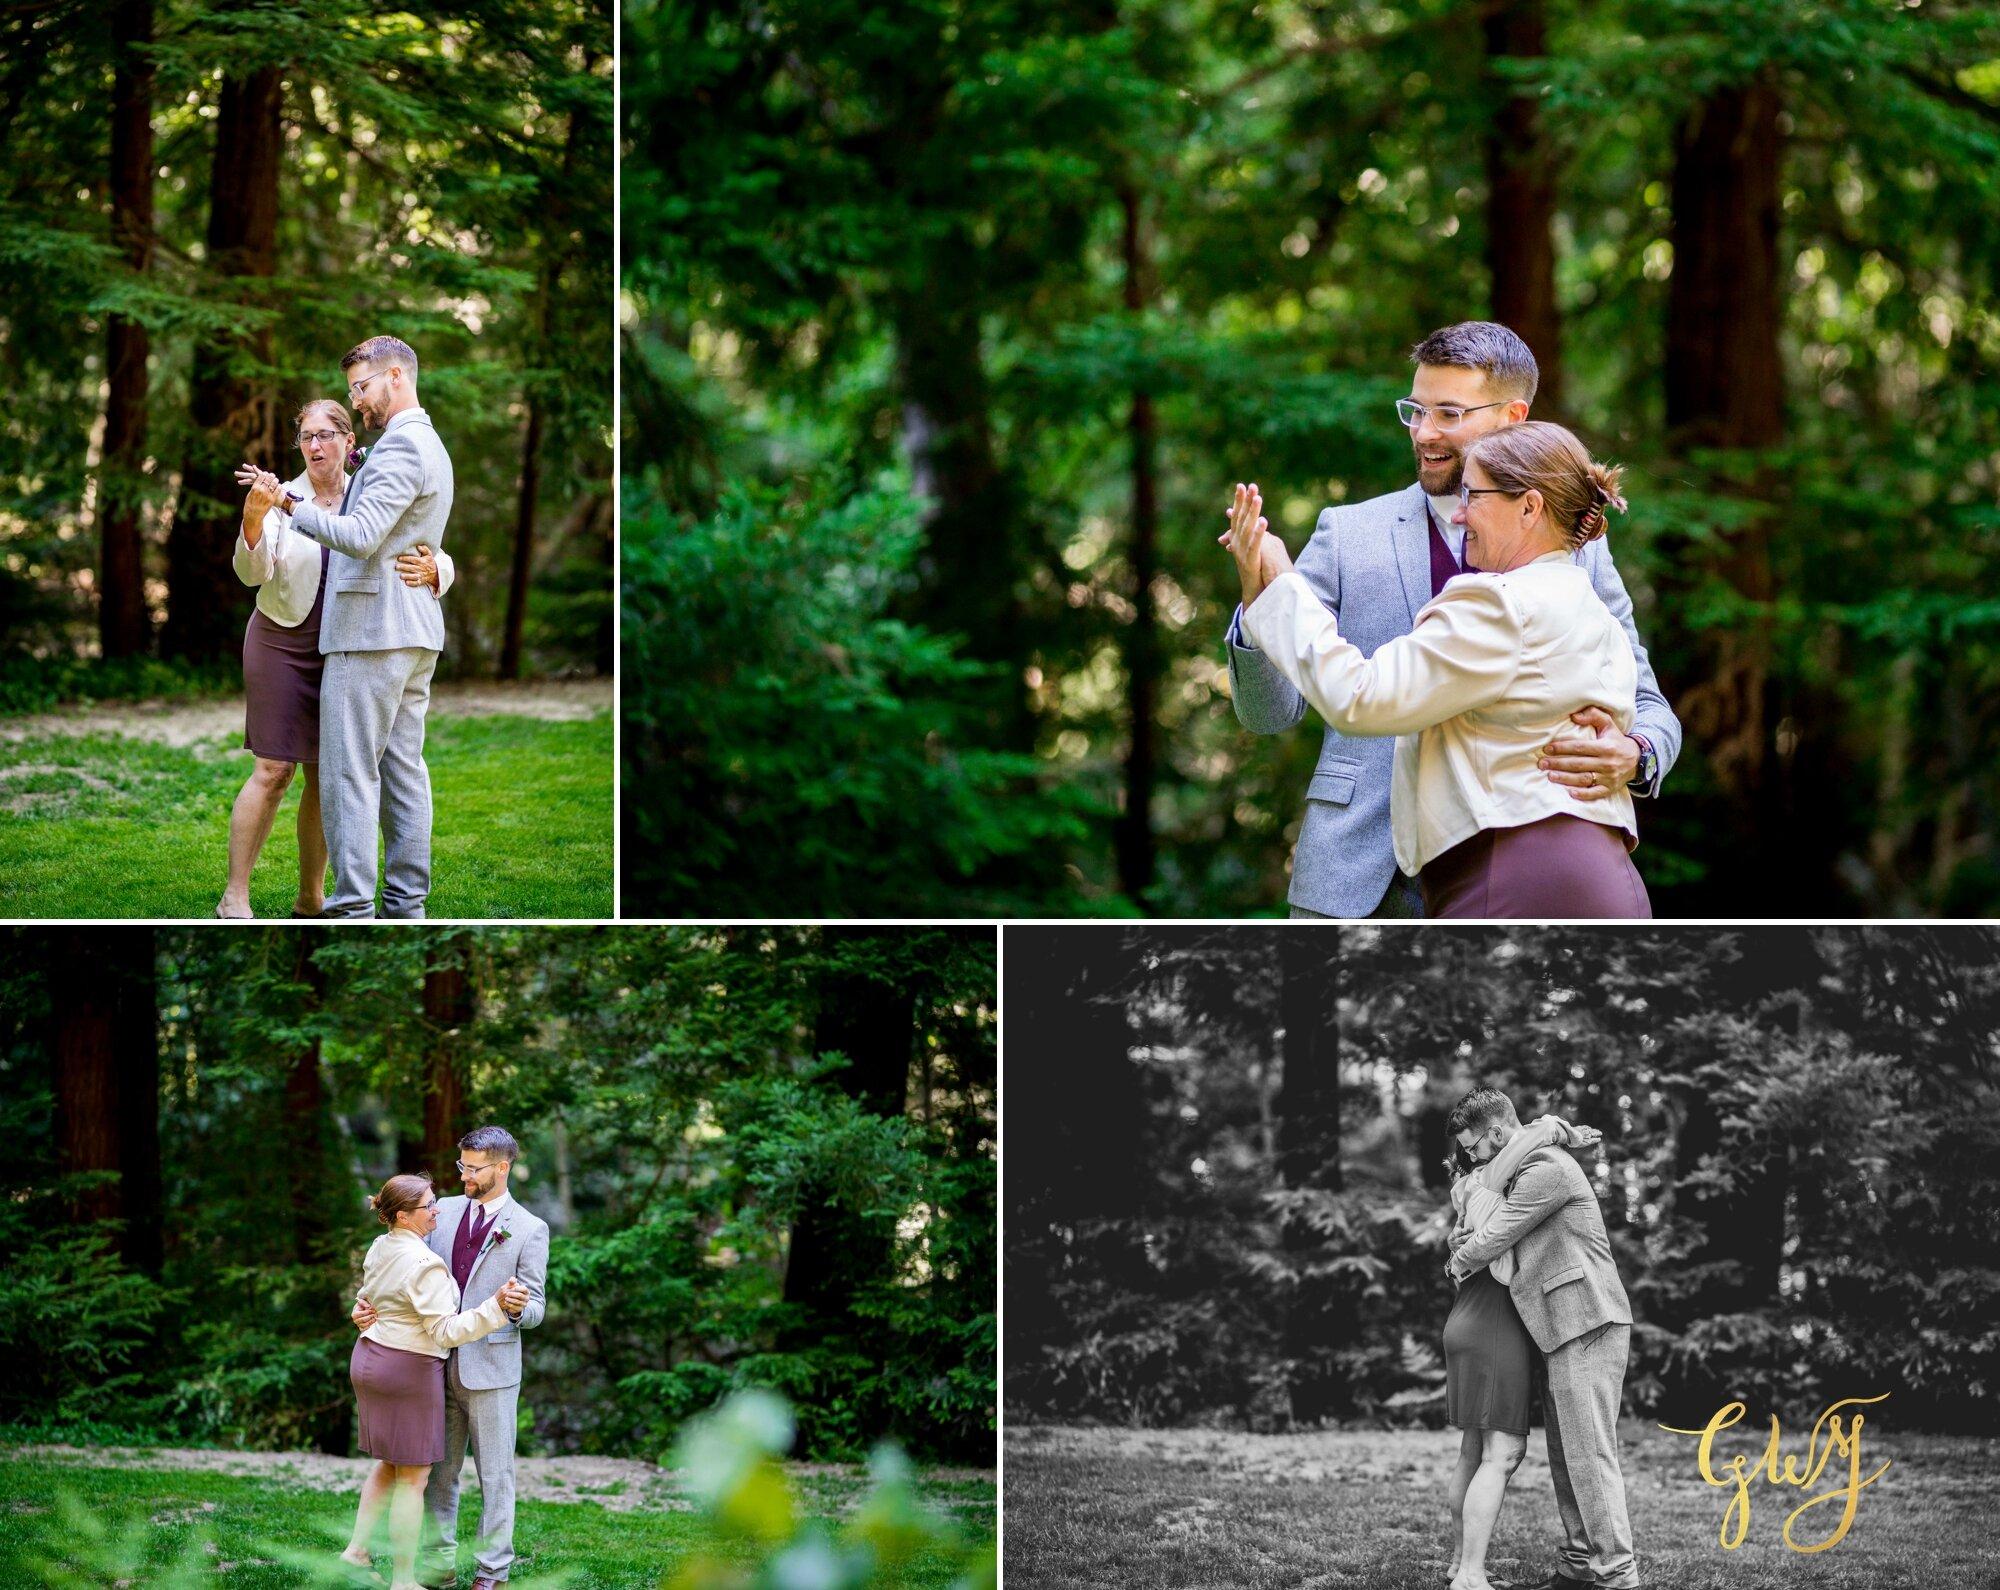 Casey + Jordan's Intimate Big Sur Elopement in the Redwoods by Glass Woods Media 48.jpg